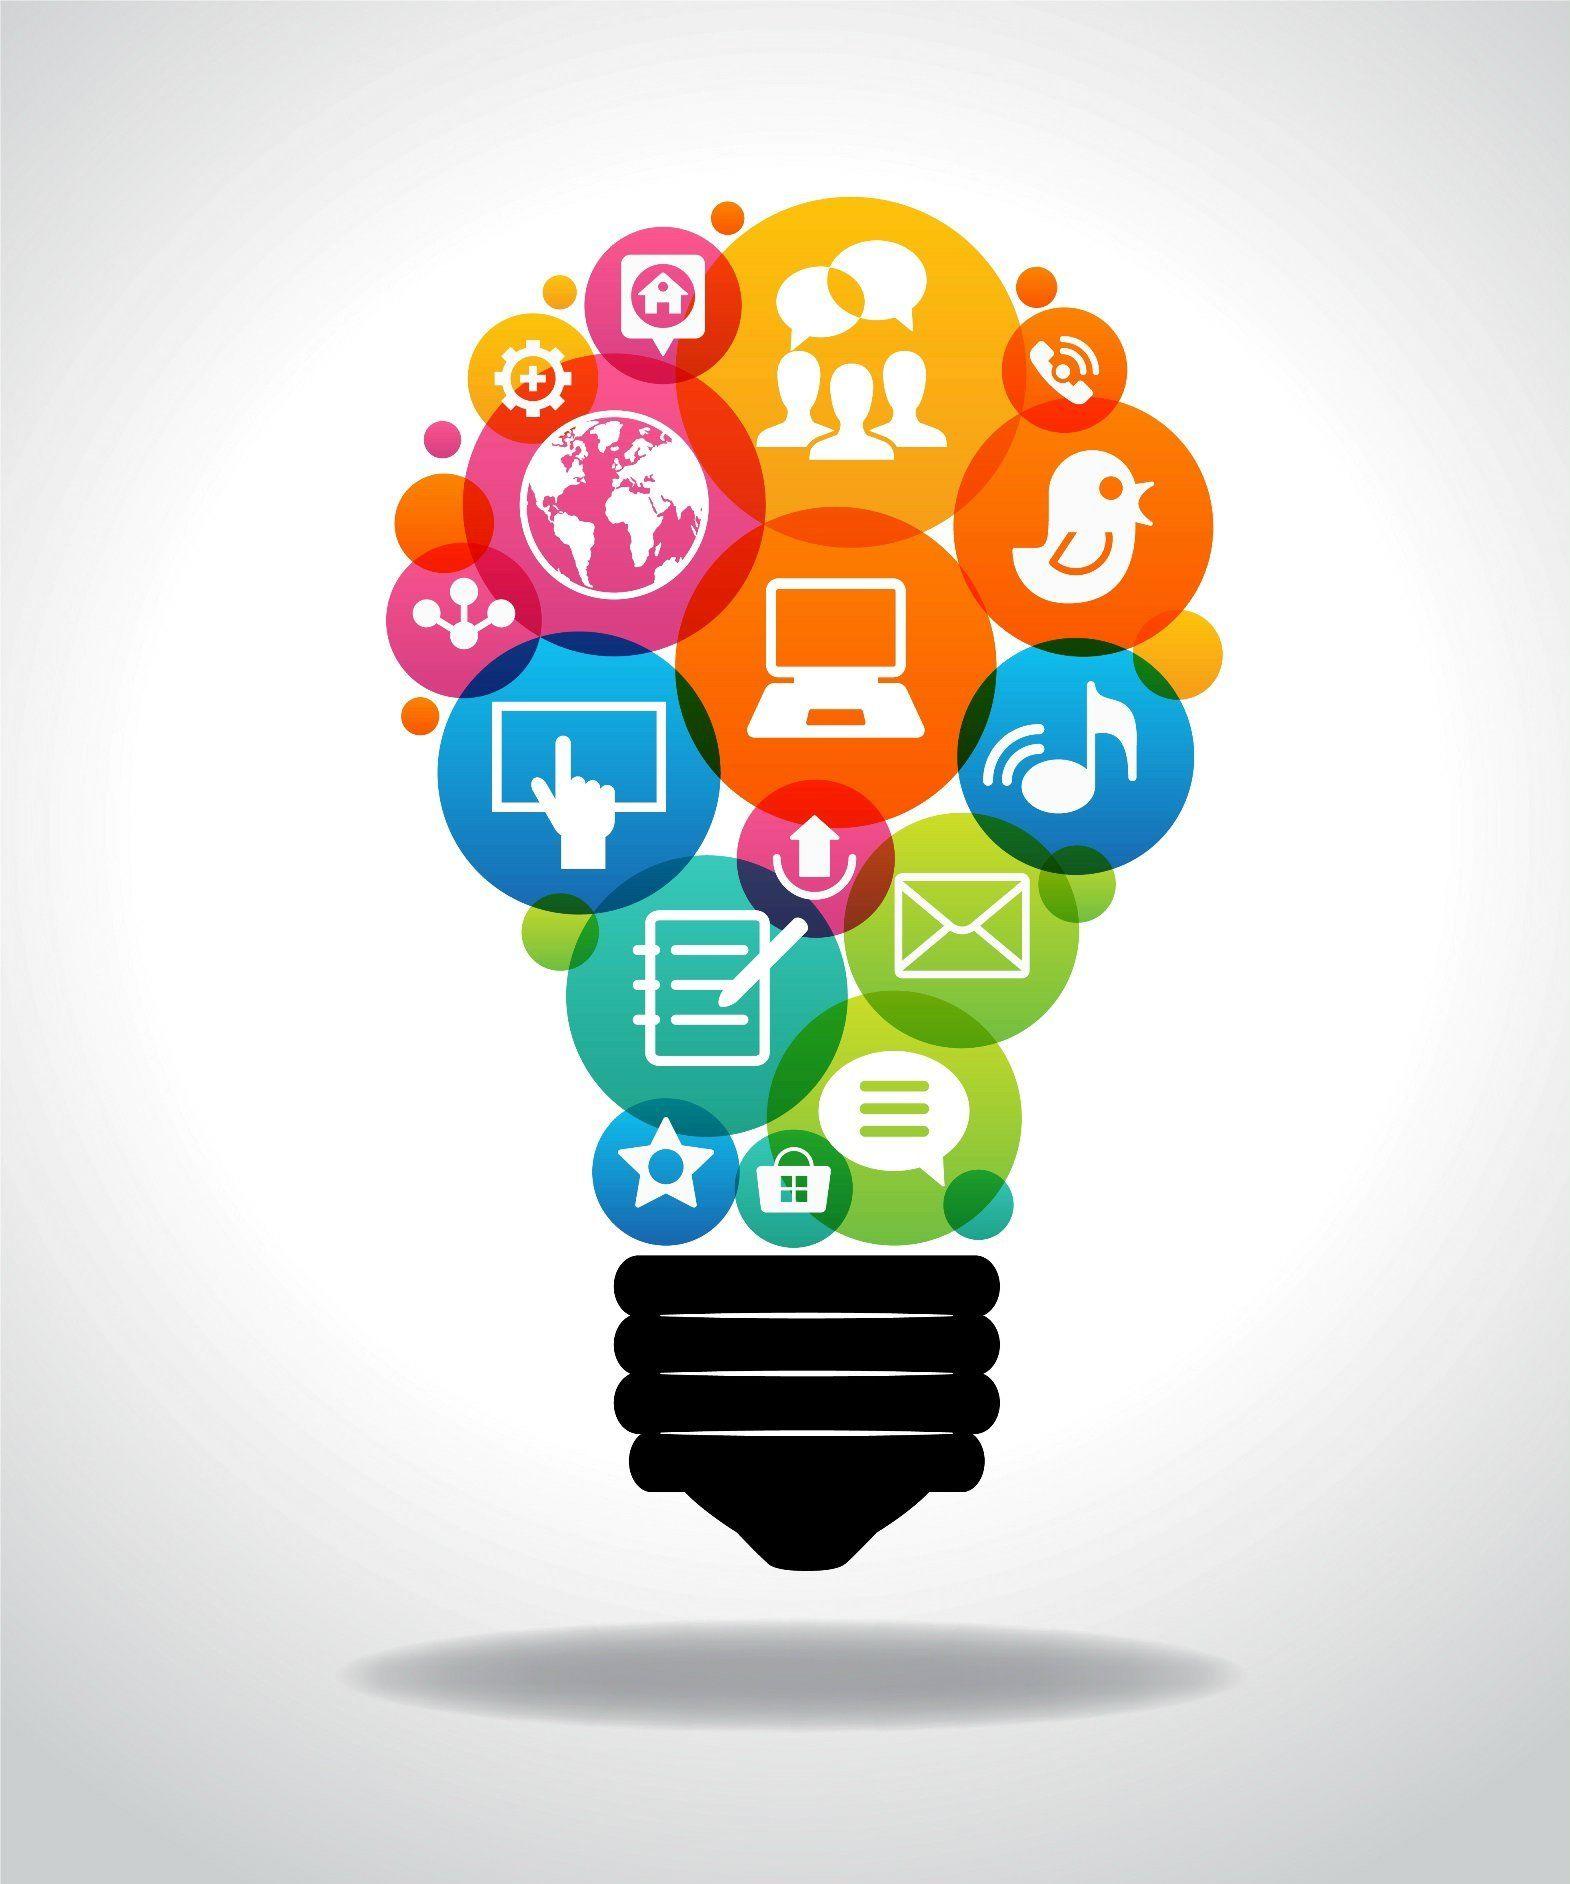 Best Practices Of Internet Marketing